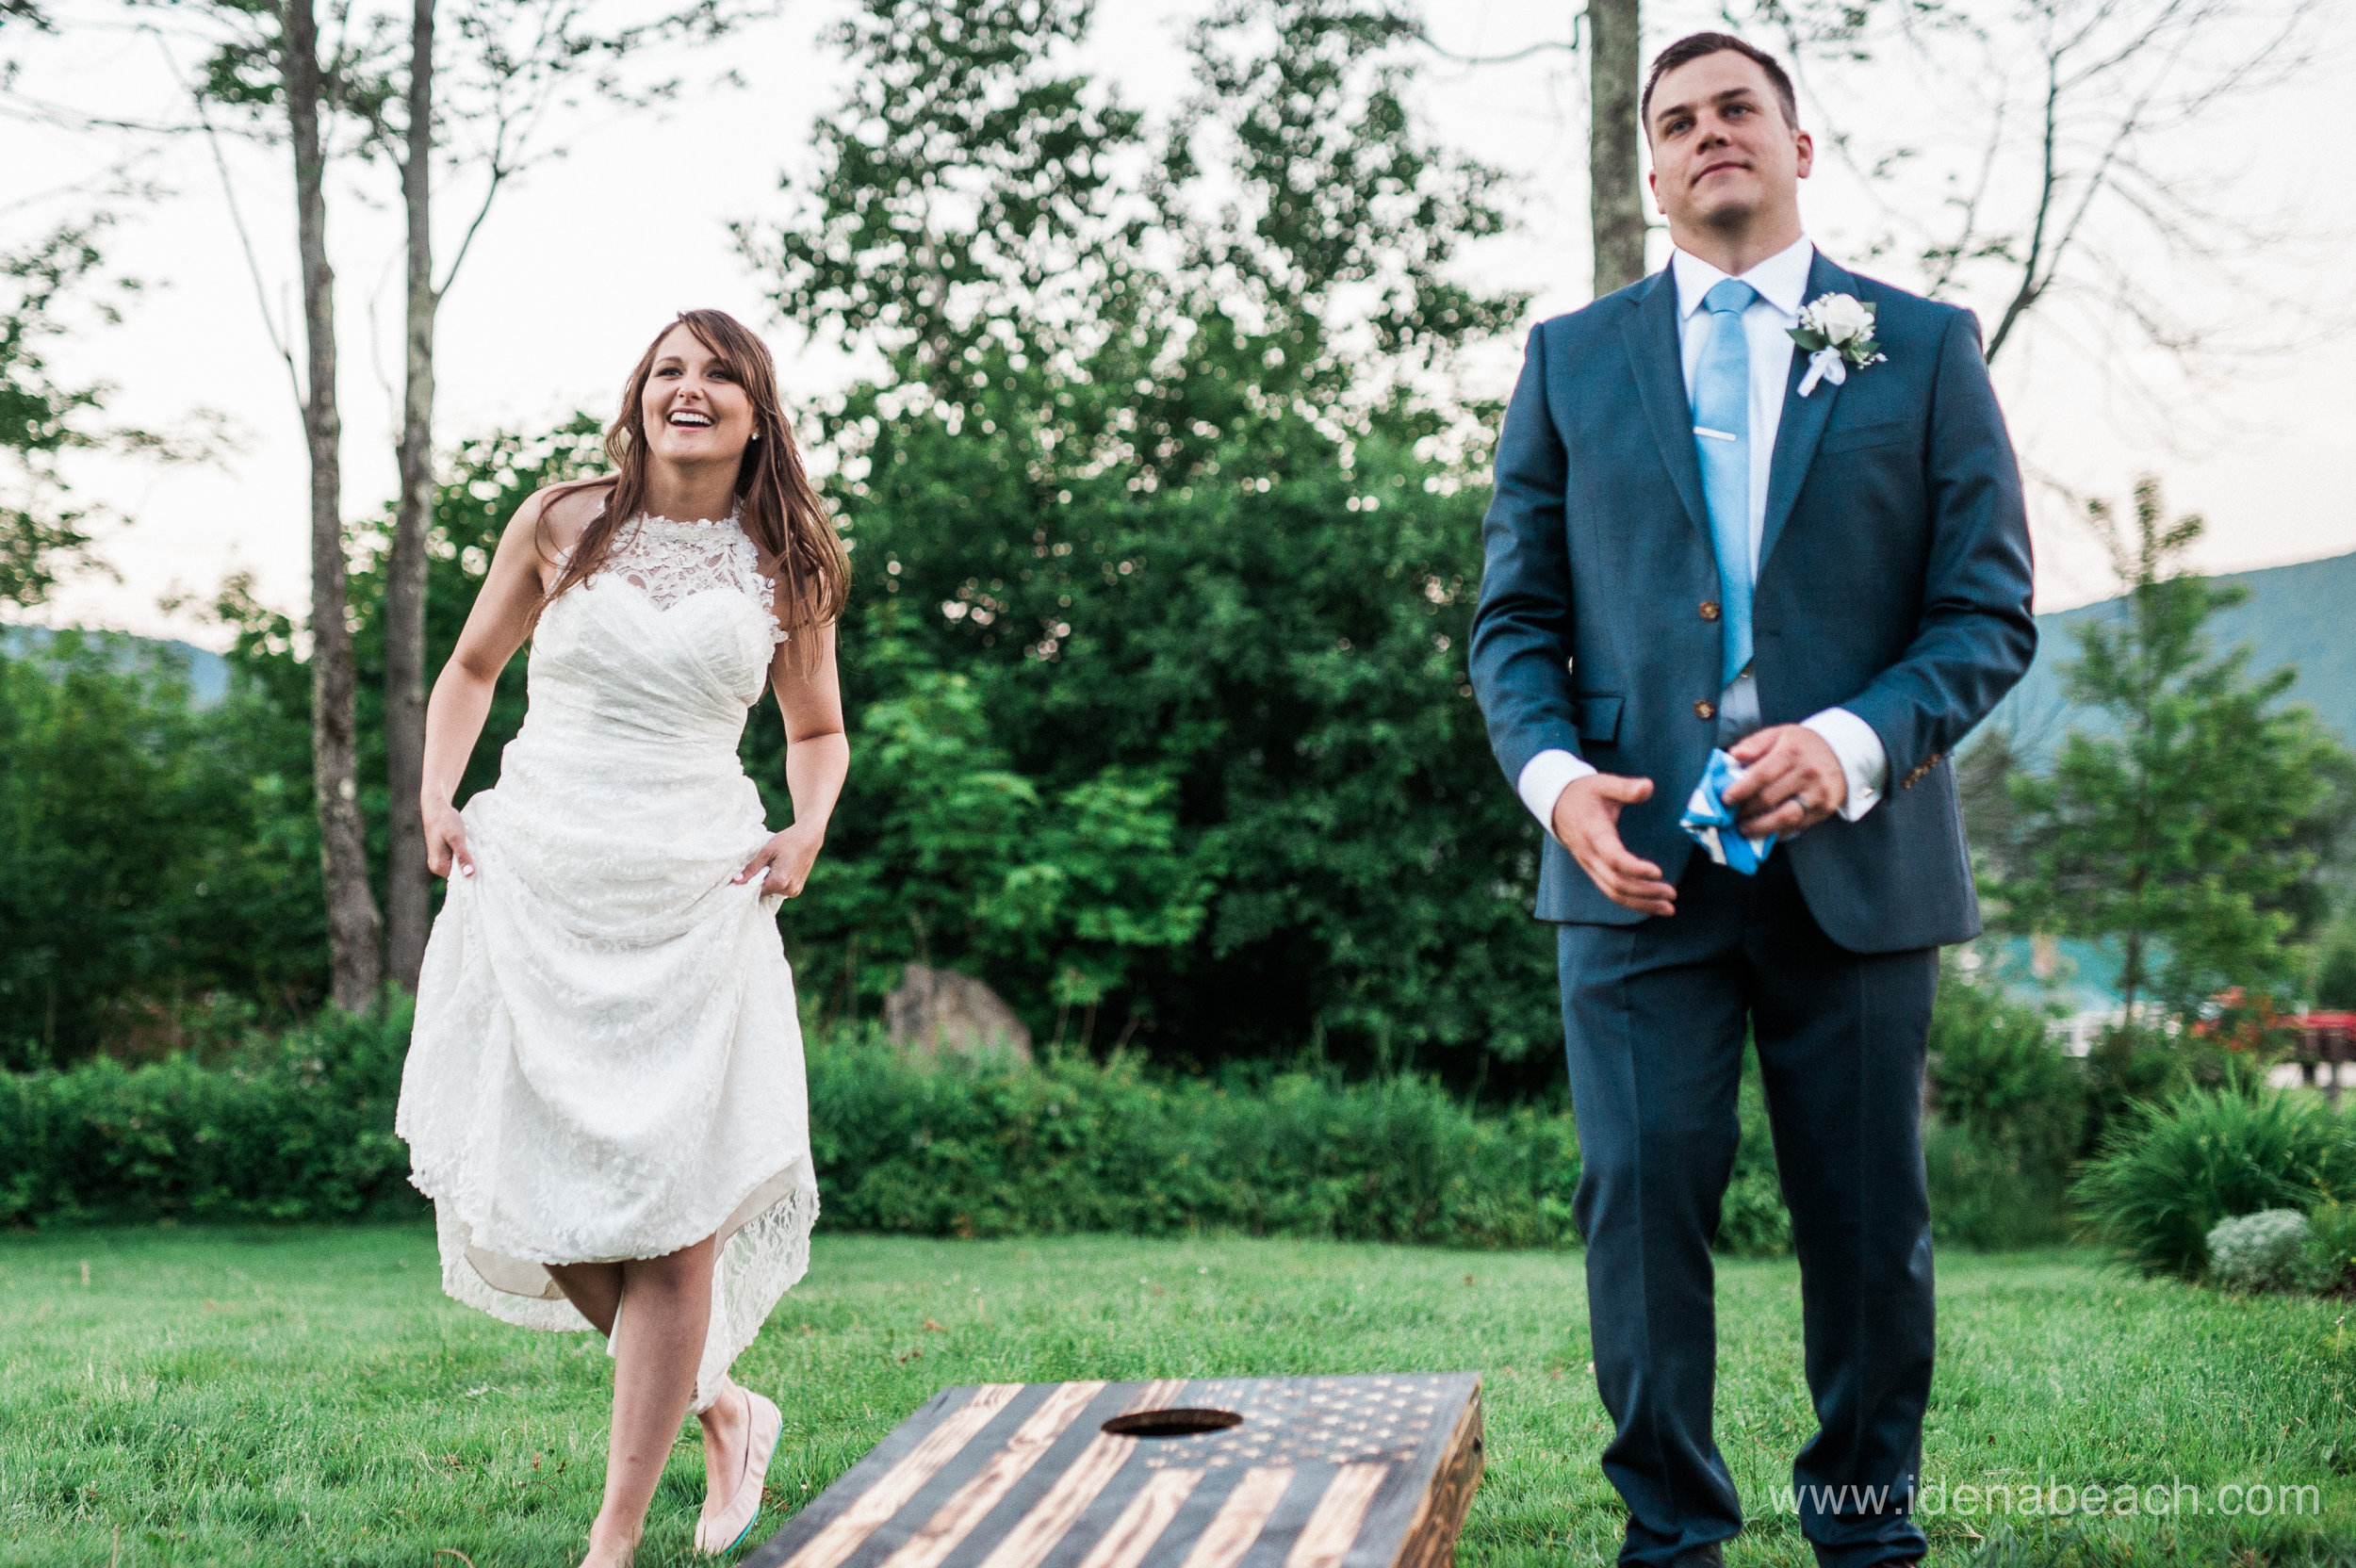 Mountain-Top-Inn-Vermont-Wedding-Photographer-157.jpg